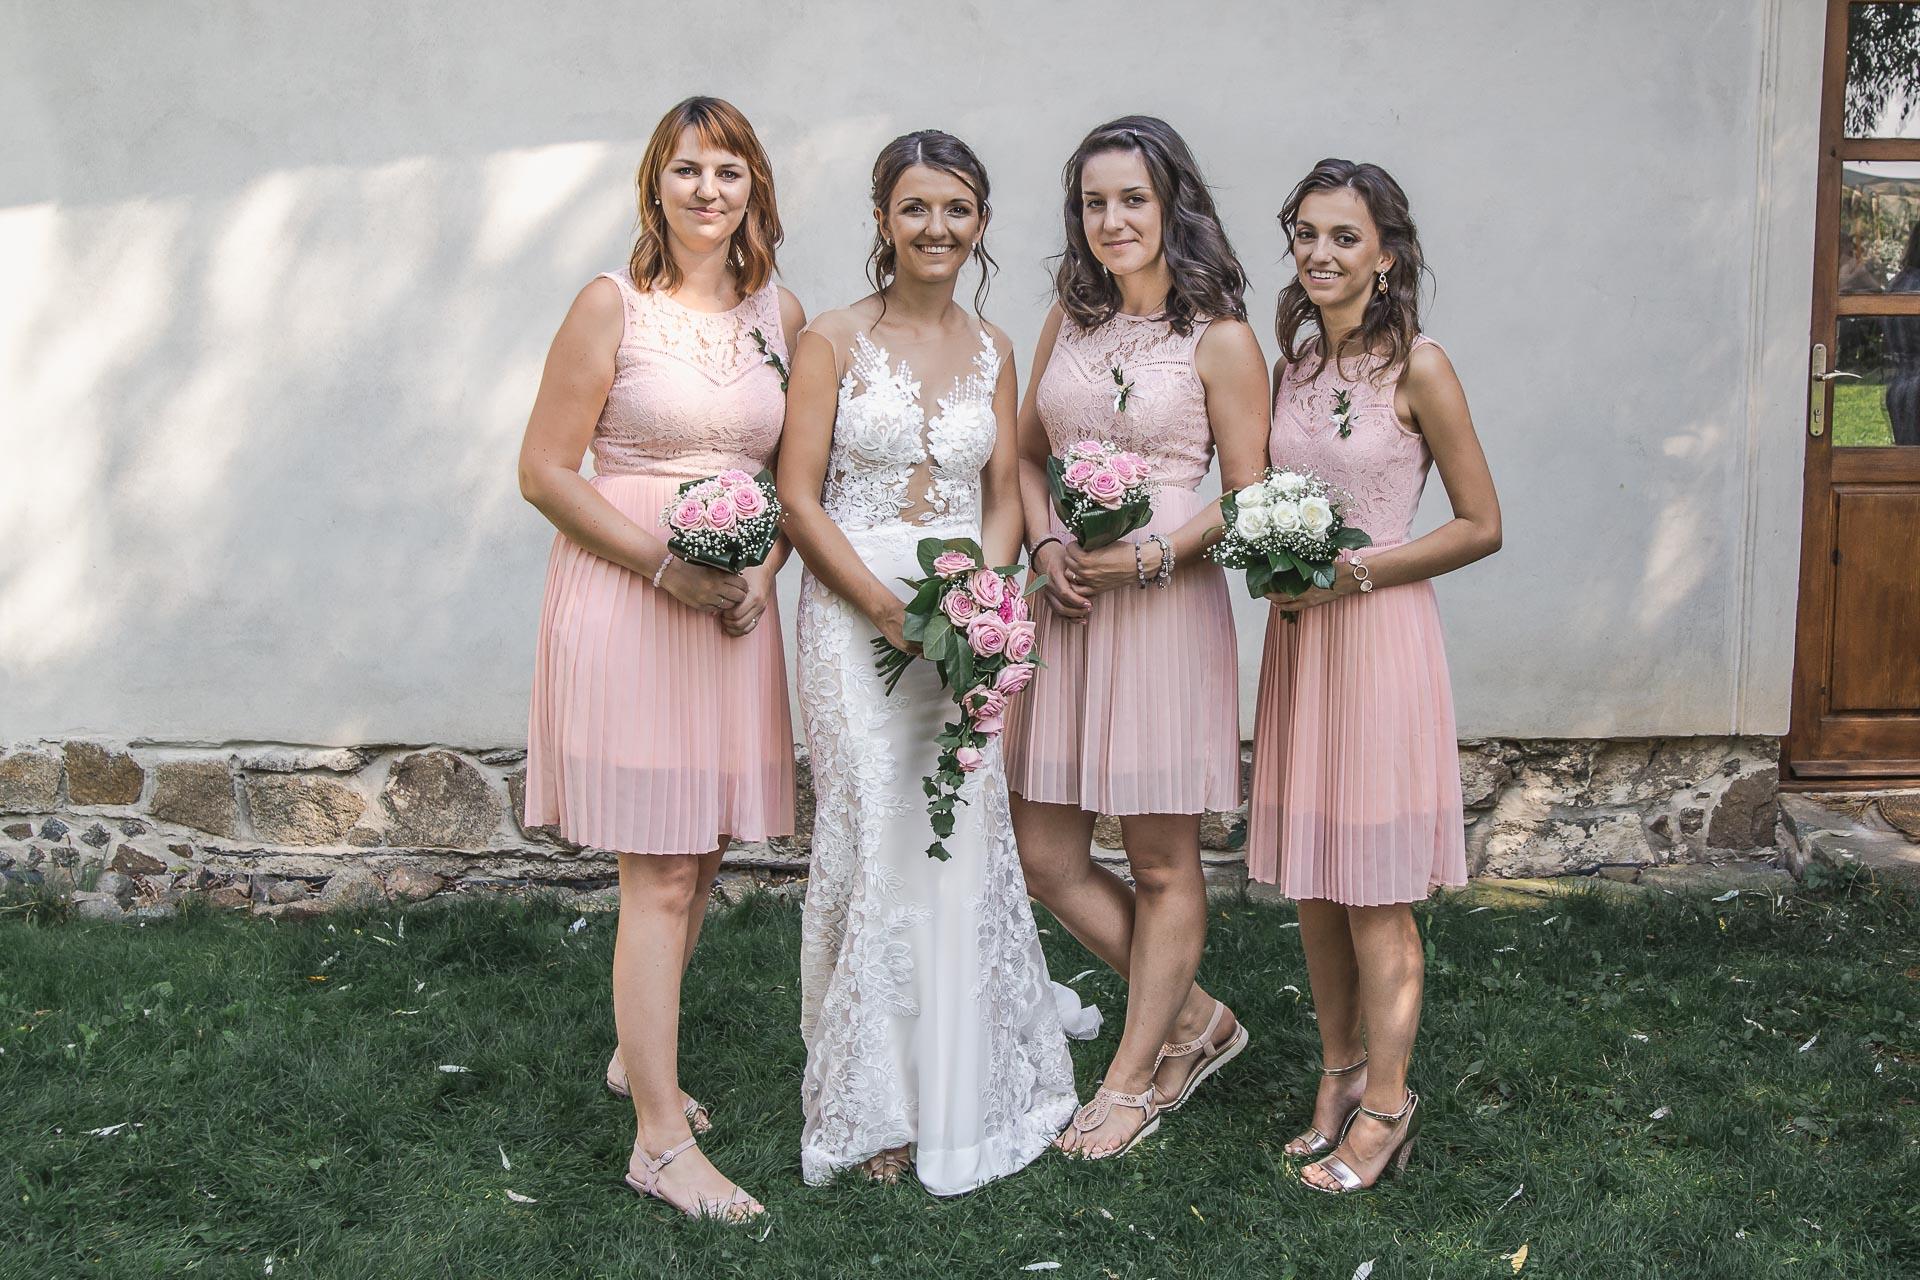 svatební-fotograf-wedding-svatebni-video-orlík-vltava-kostel-statek-stodola-boho-svatba-Beautyfoto-406